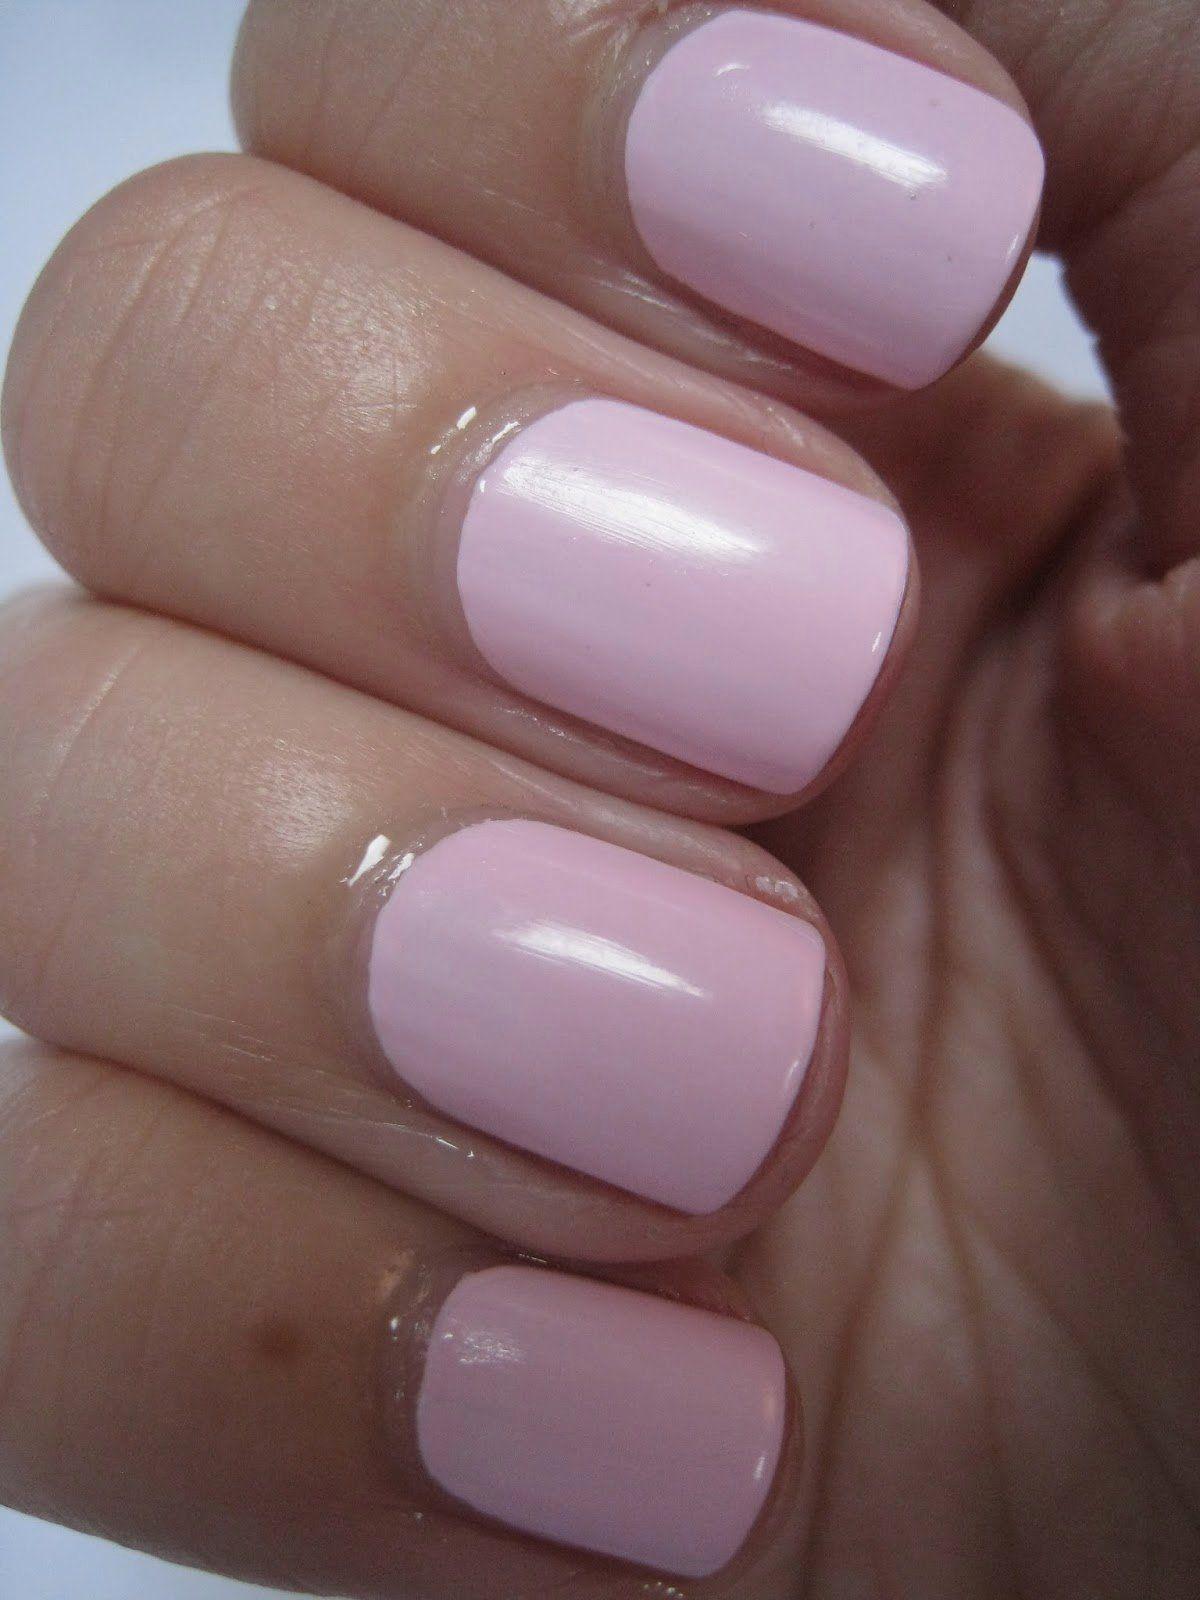 Go Polished: Pale Pink Polish Showdown!